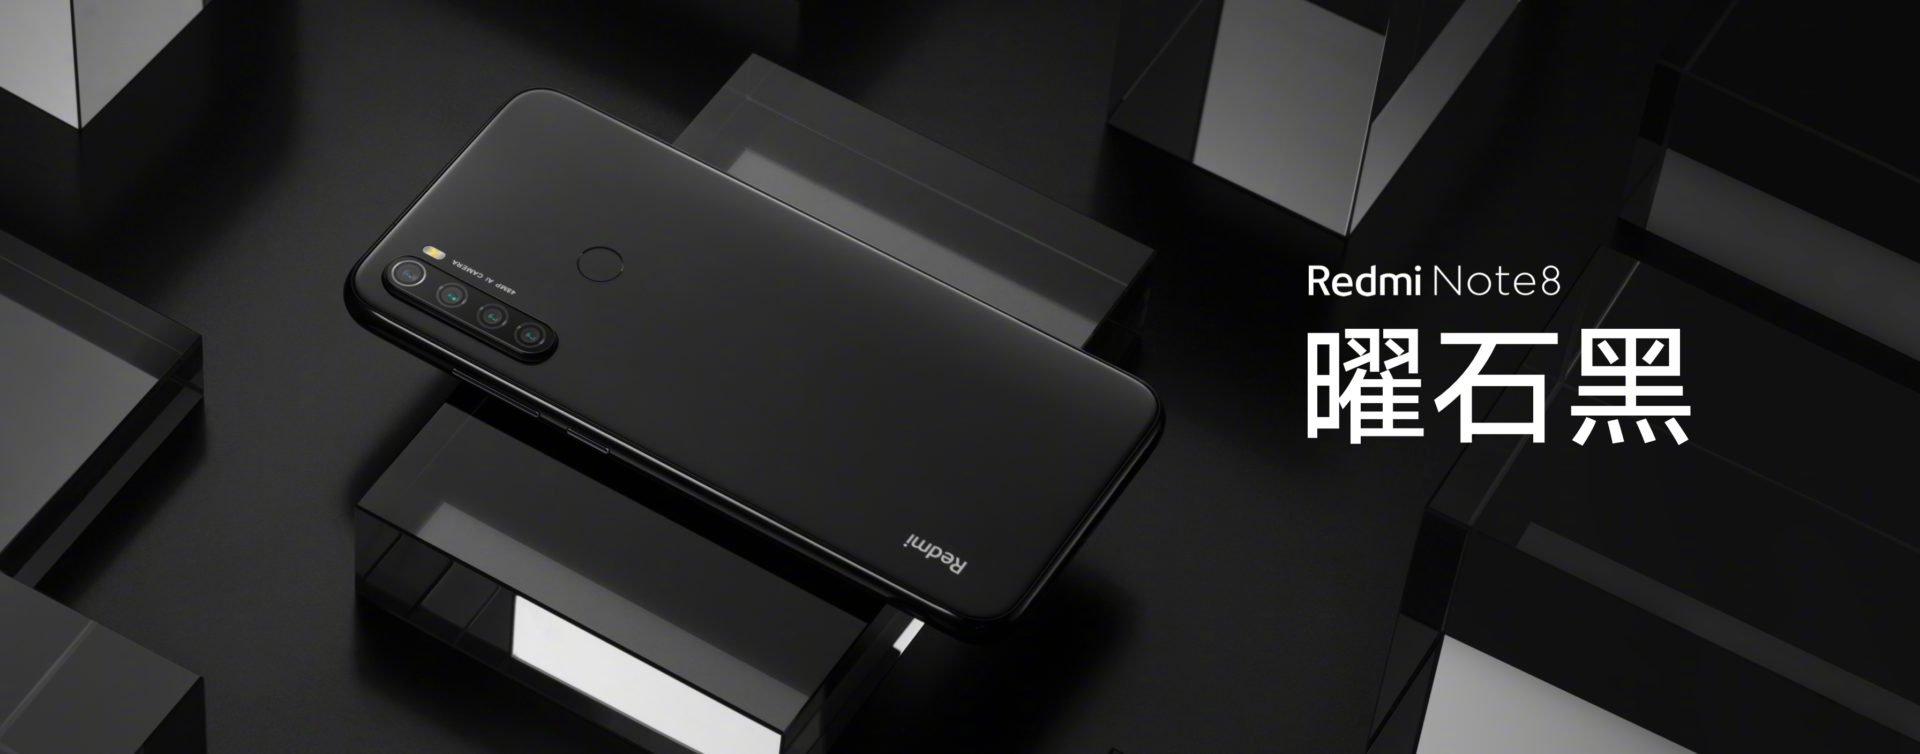 Redmi Note 8 has 4,000mAh battery